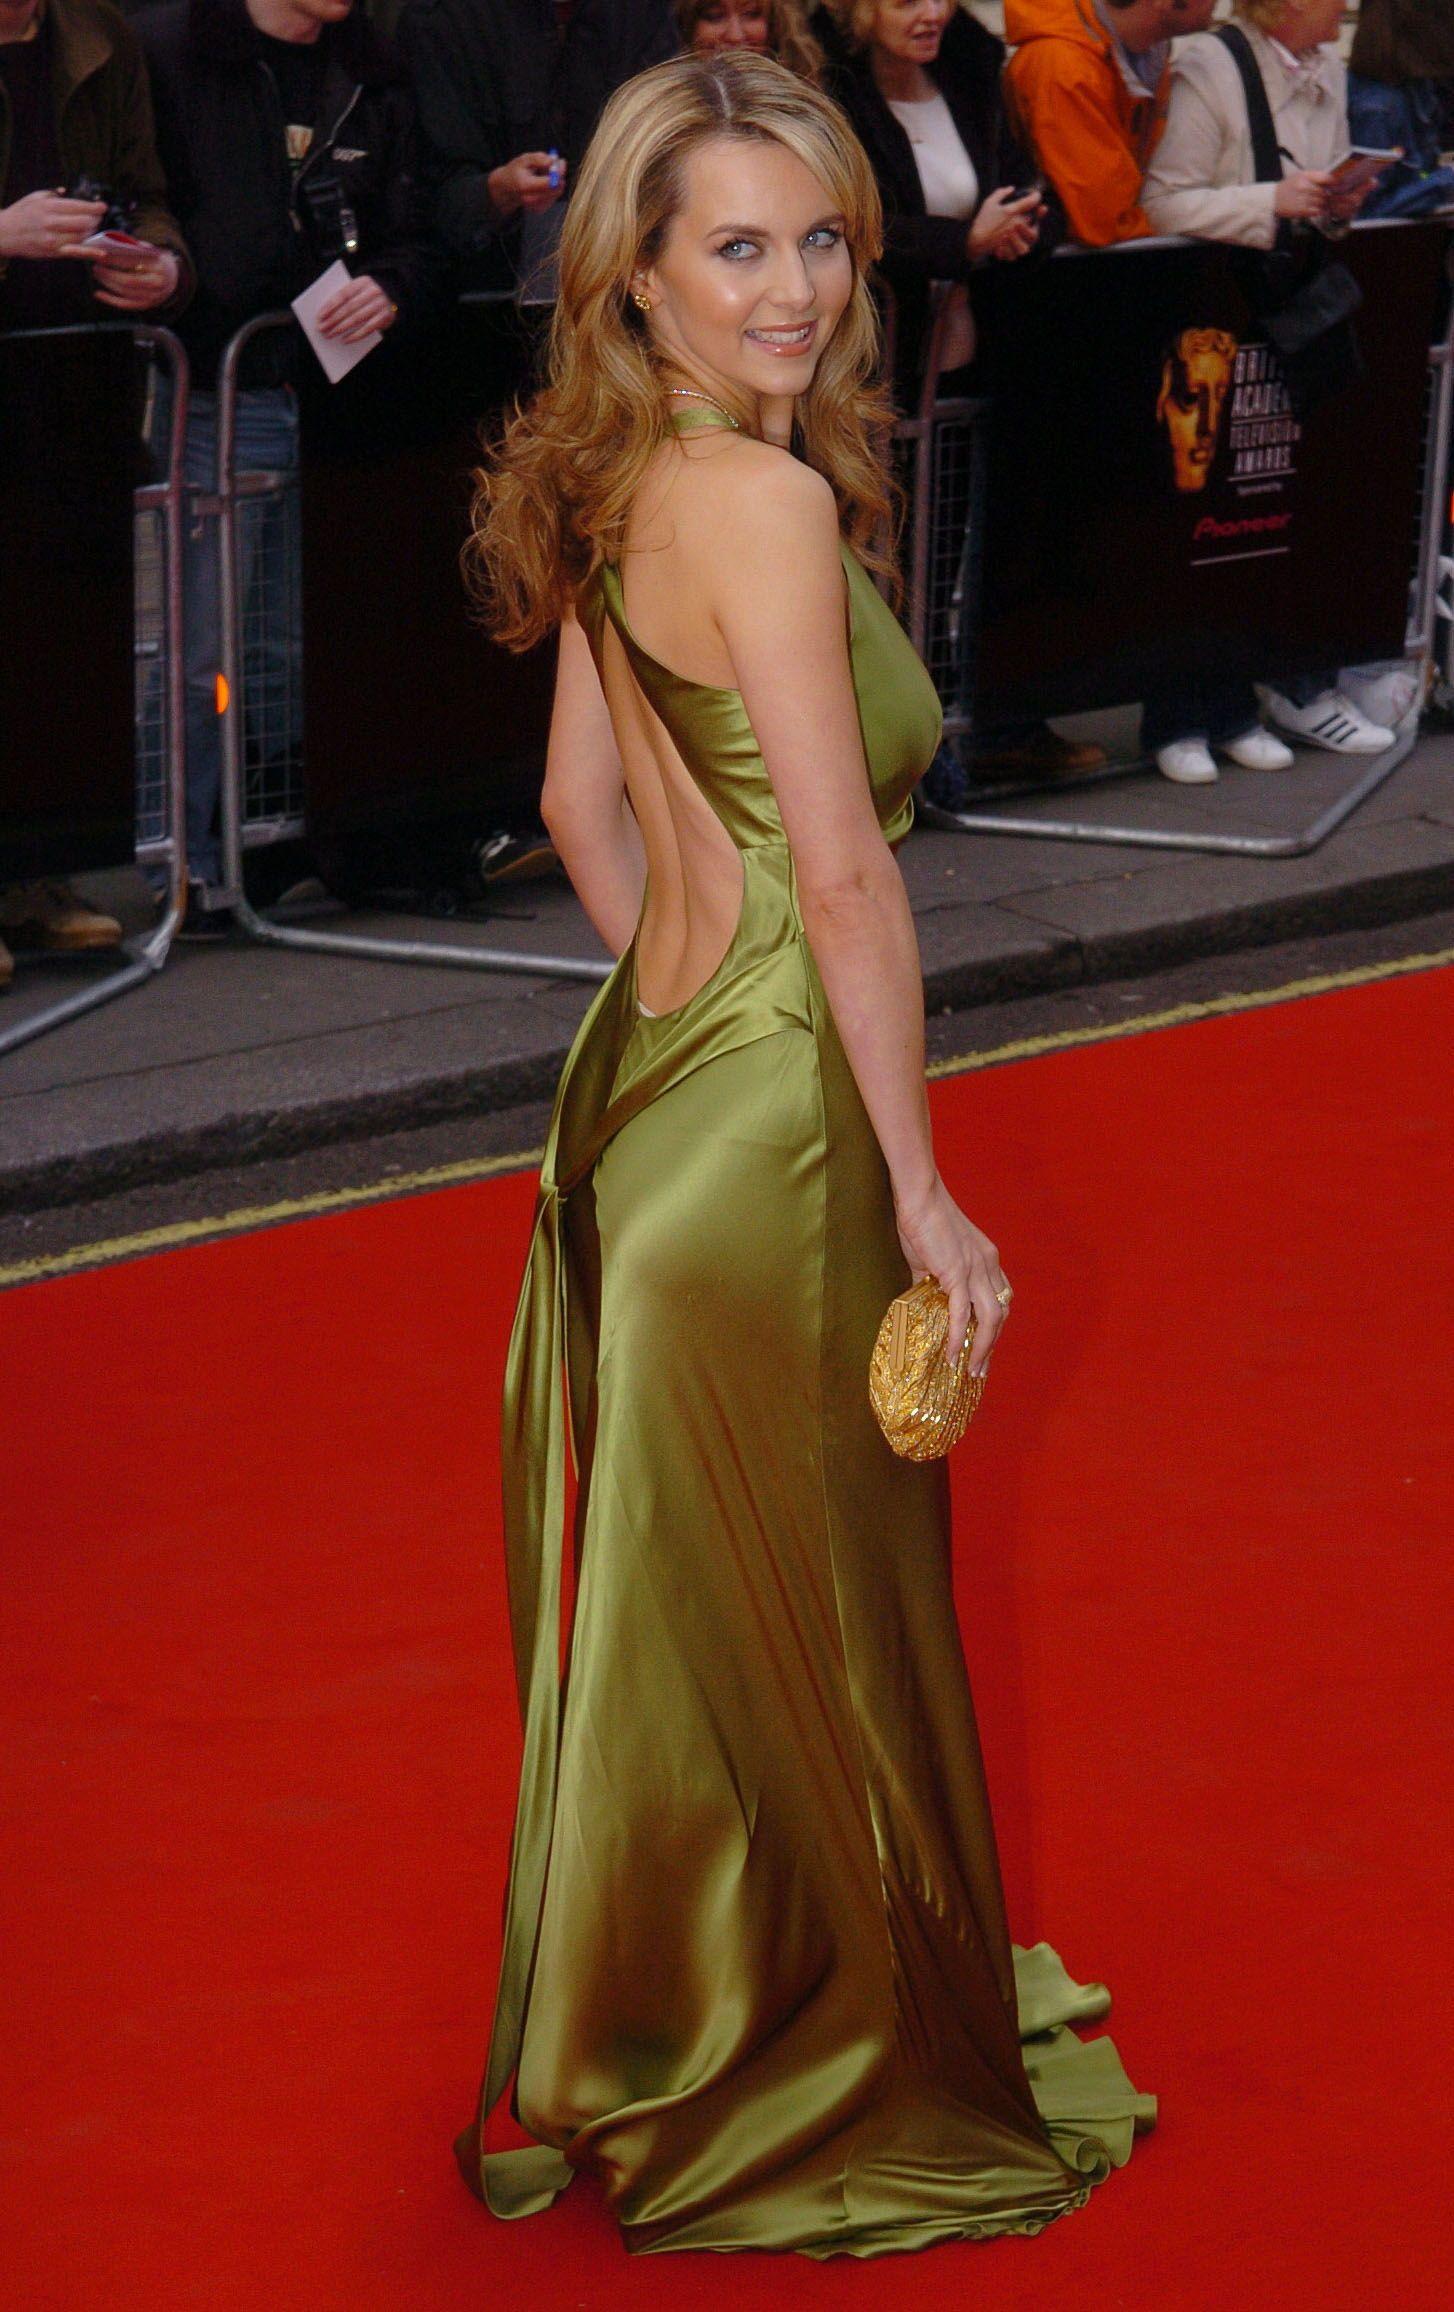 Pincristina Ristoiu On Silk Top  Dresses In 2020